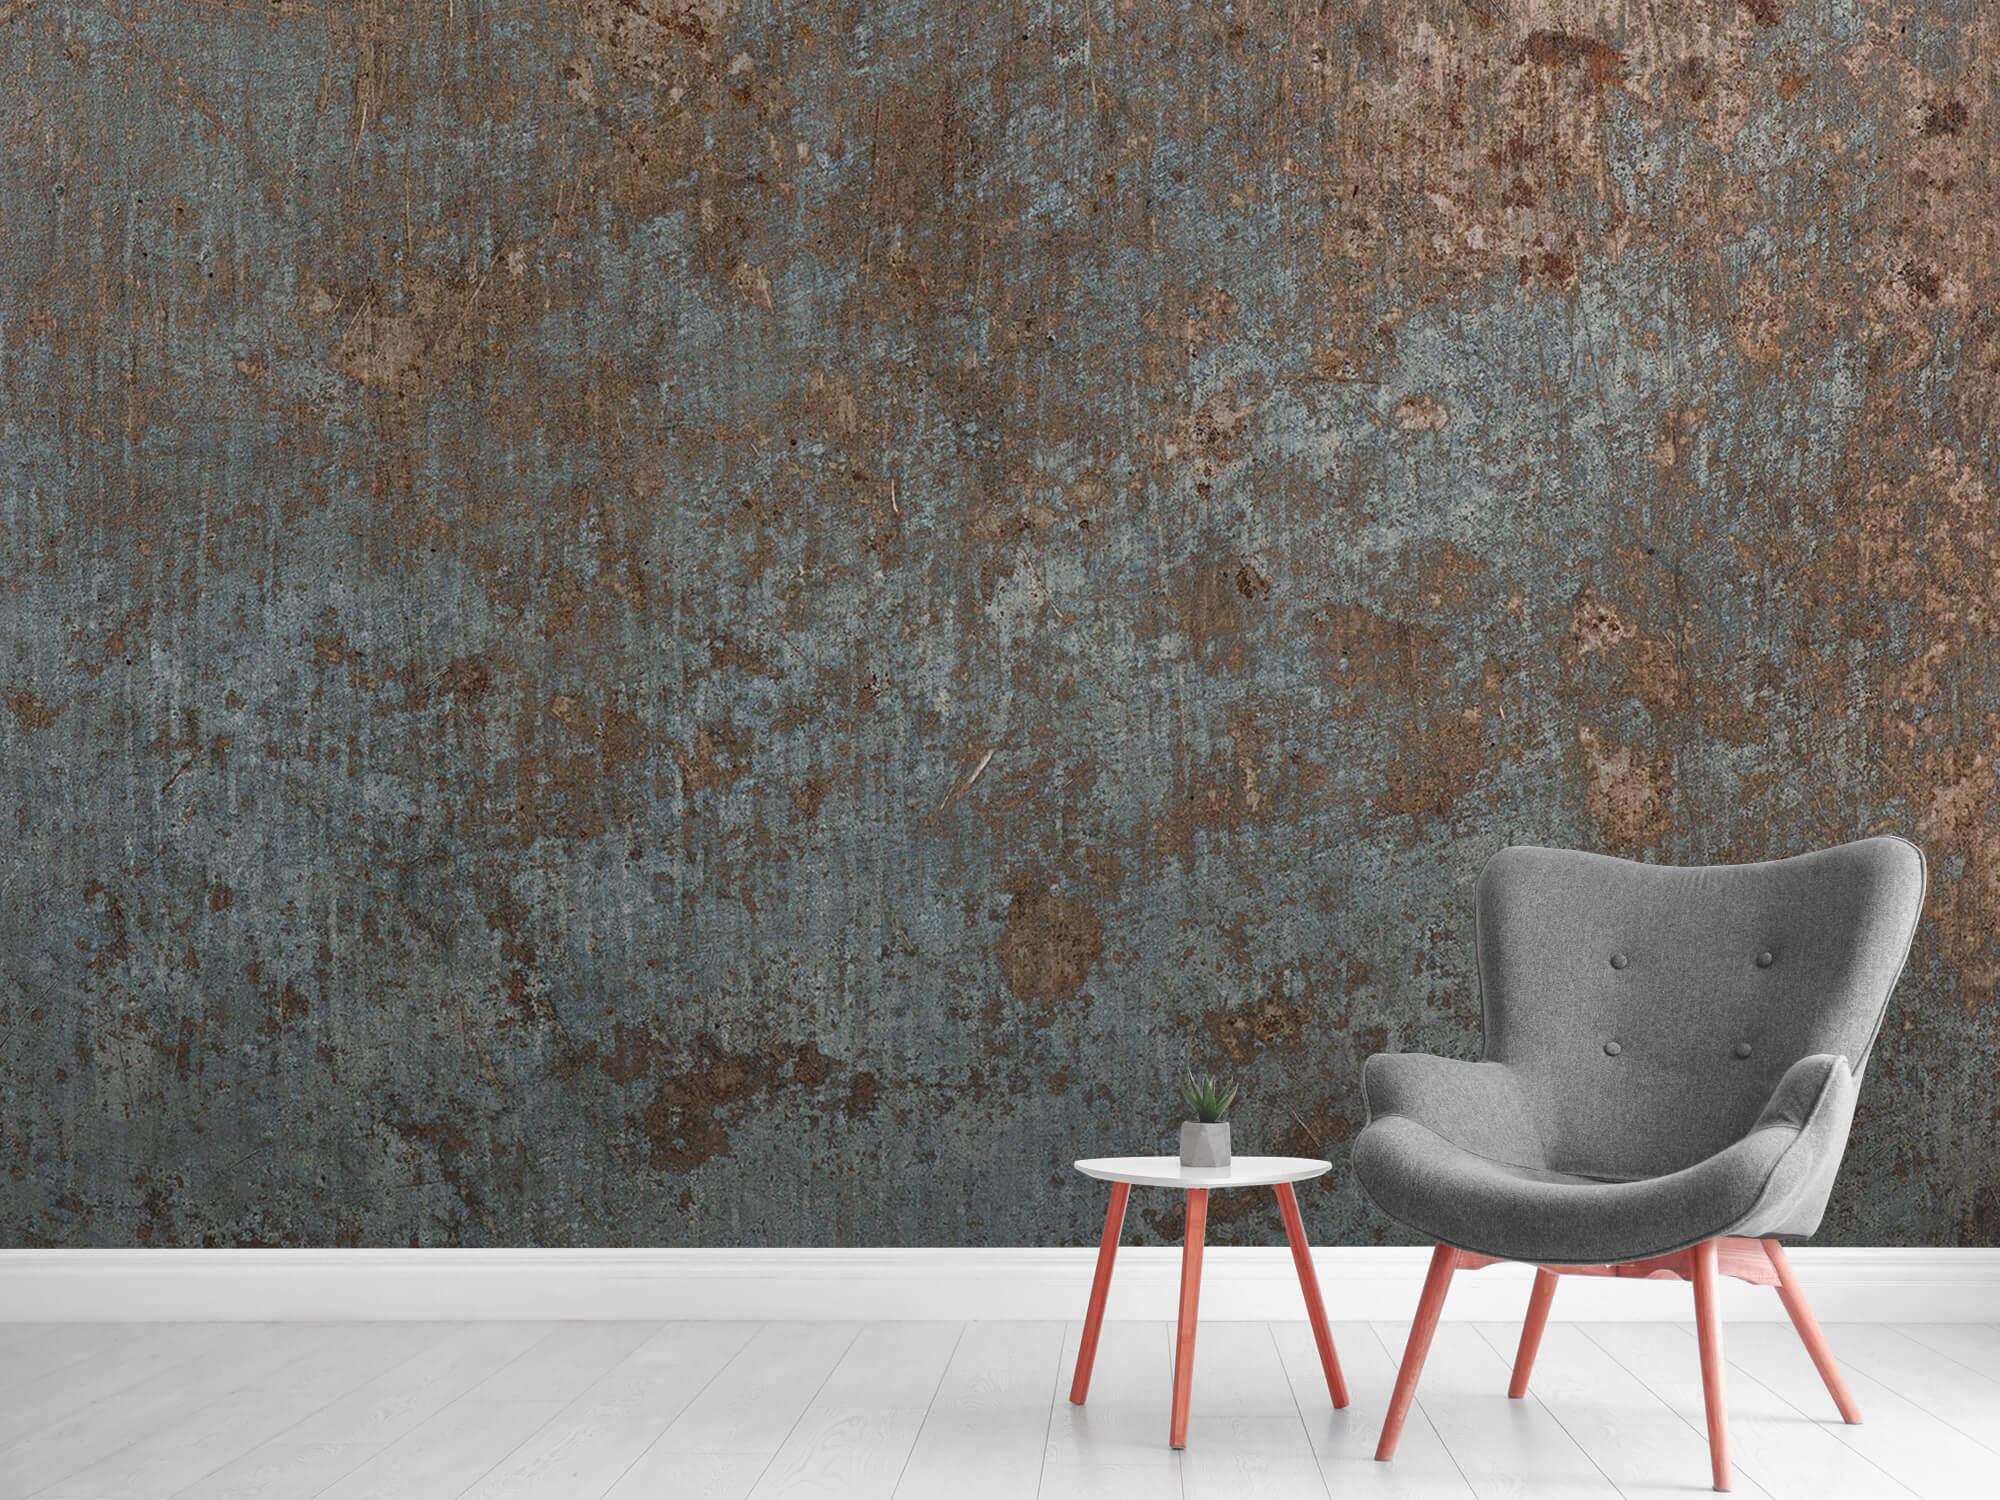 Texturen Farbstruktur Kupfer 3